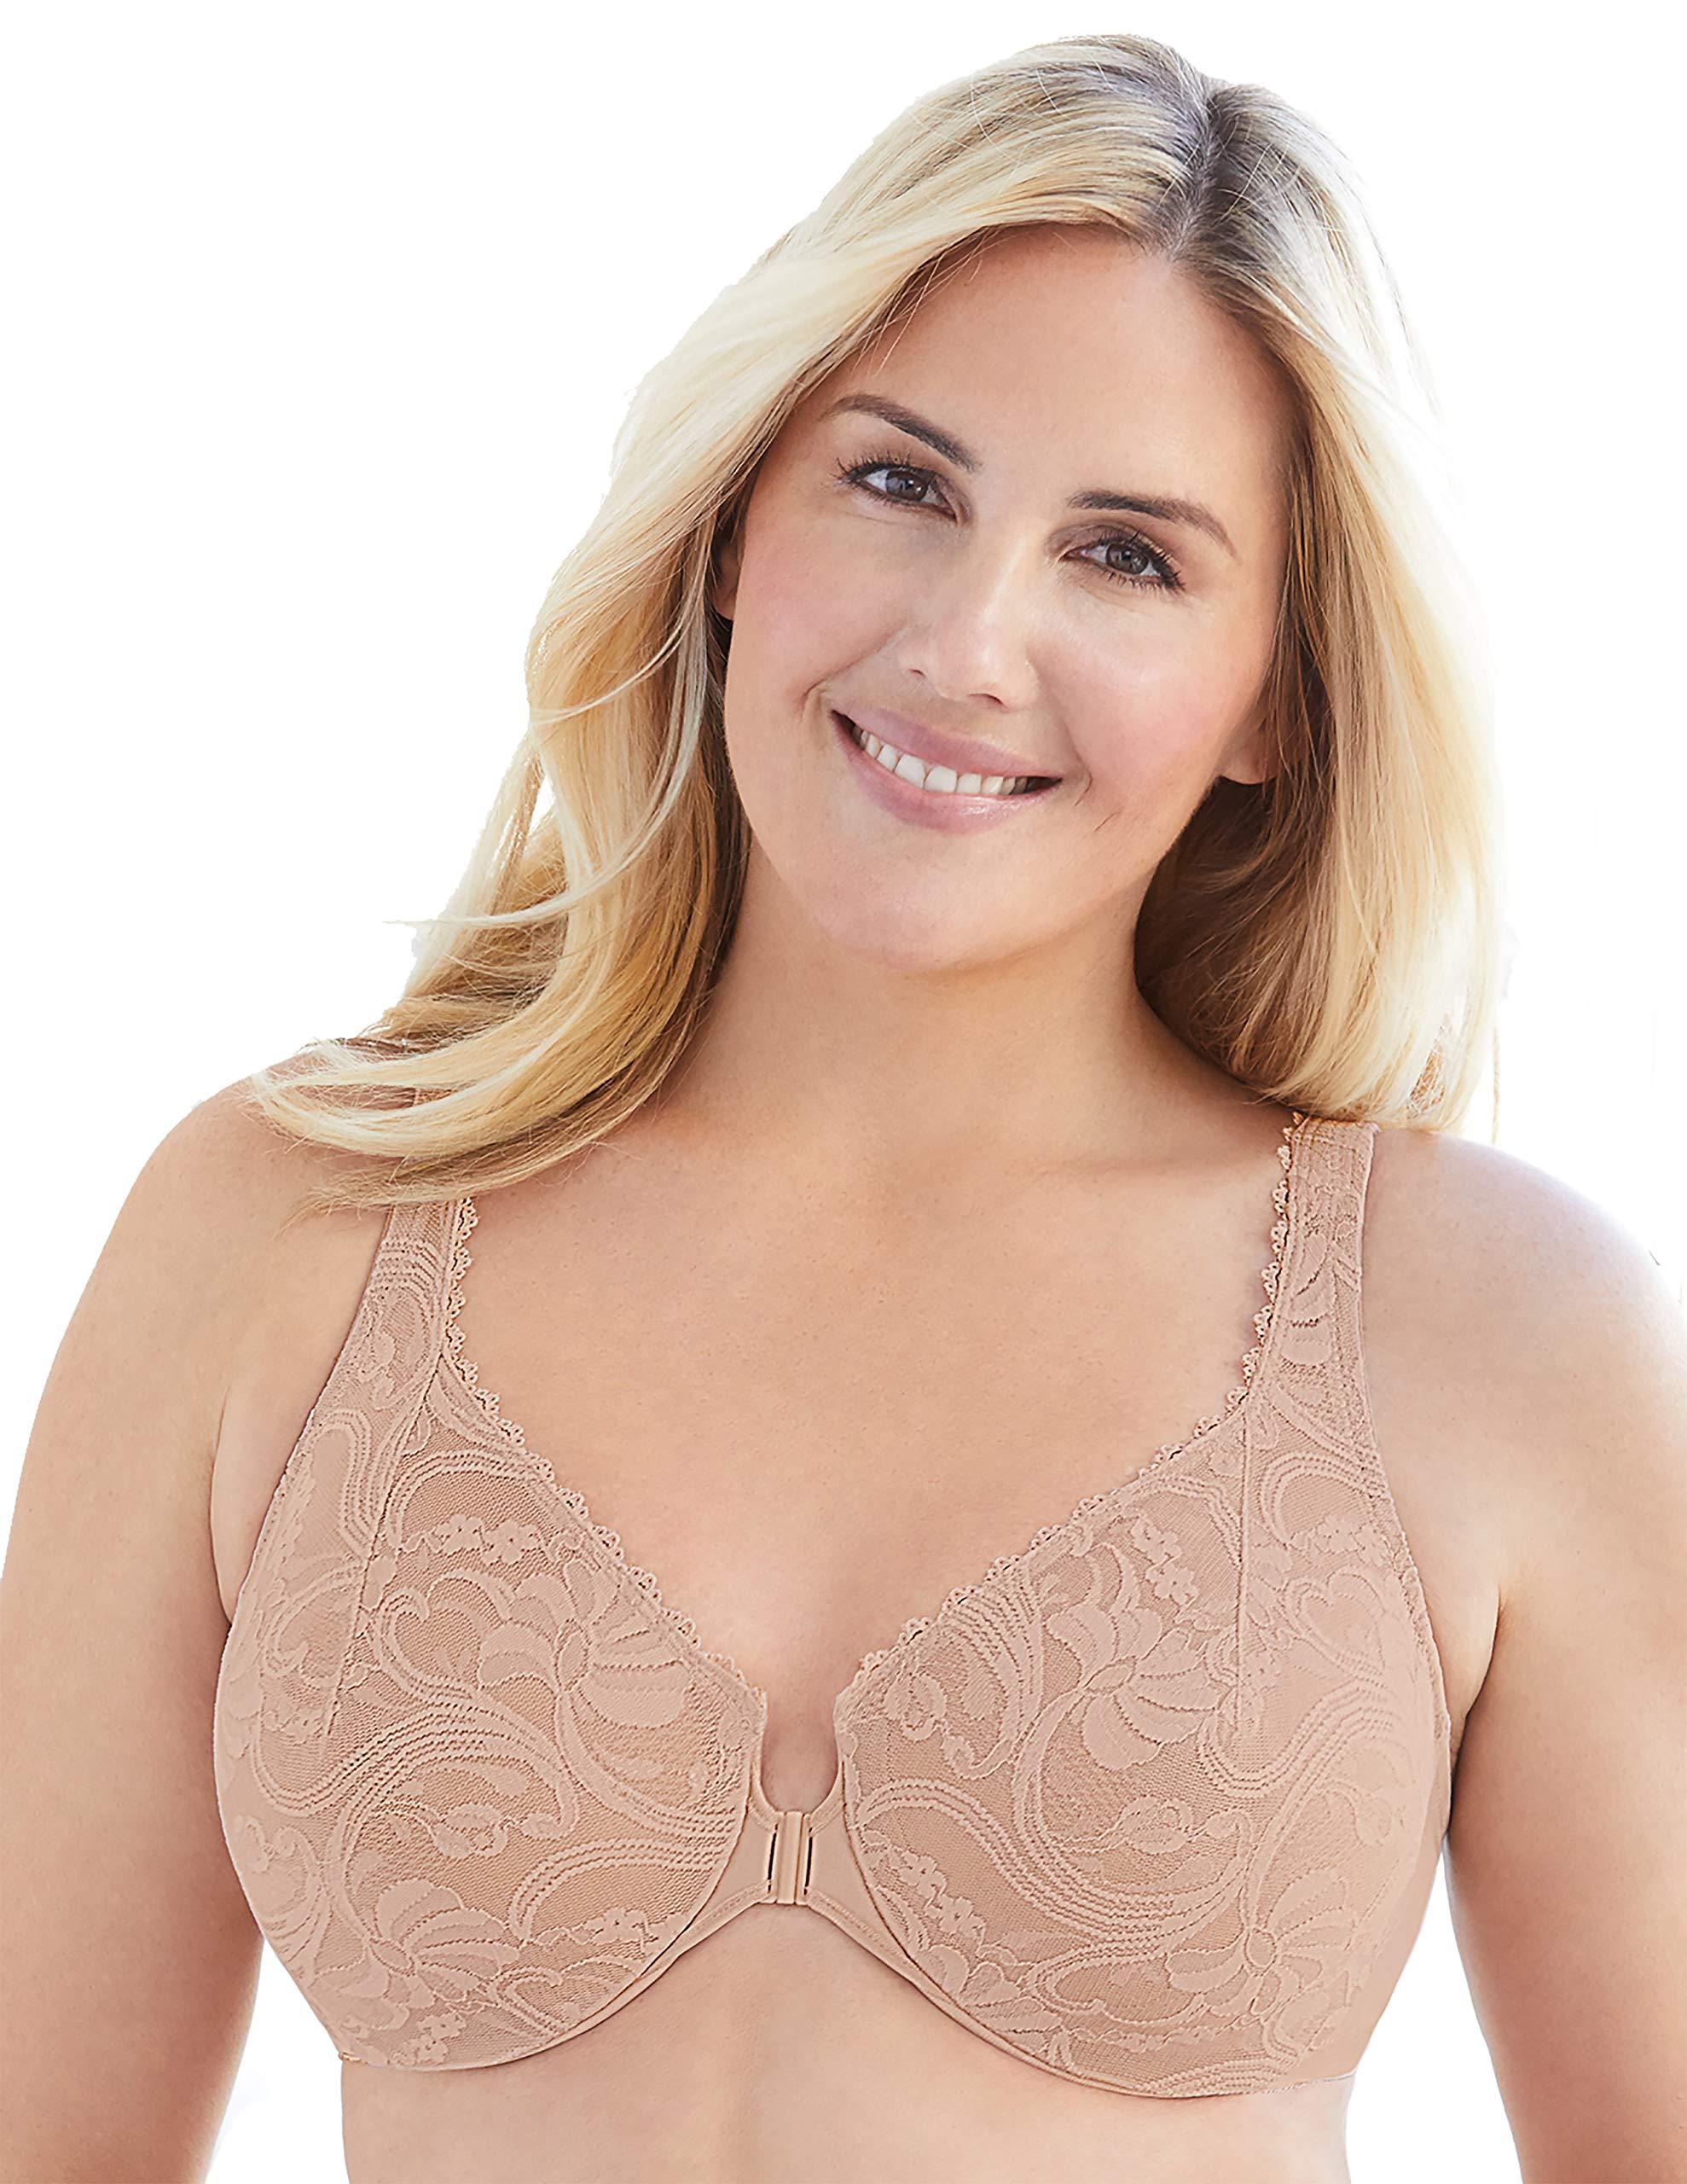 Glamorise Women's Plus Size Full Figure Wonderwire Front Close Stretch Lace Bra #9245